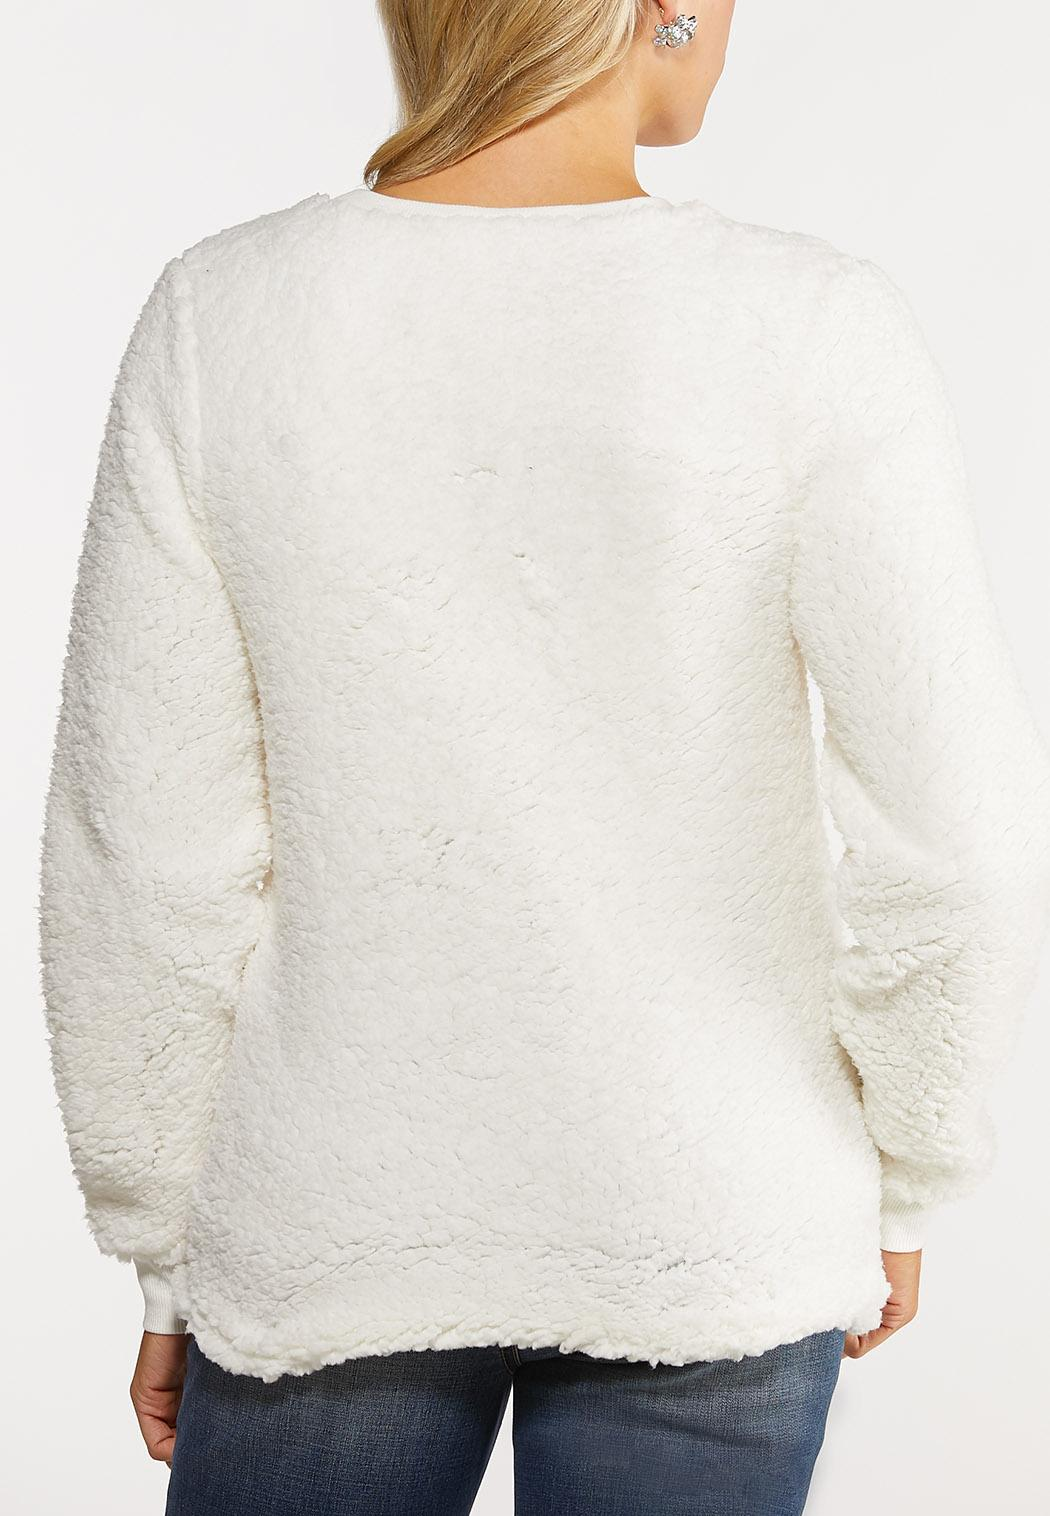 Plus Size Light Up Tree Sweatshirt (Item #44091828)